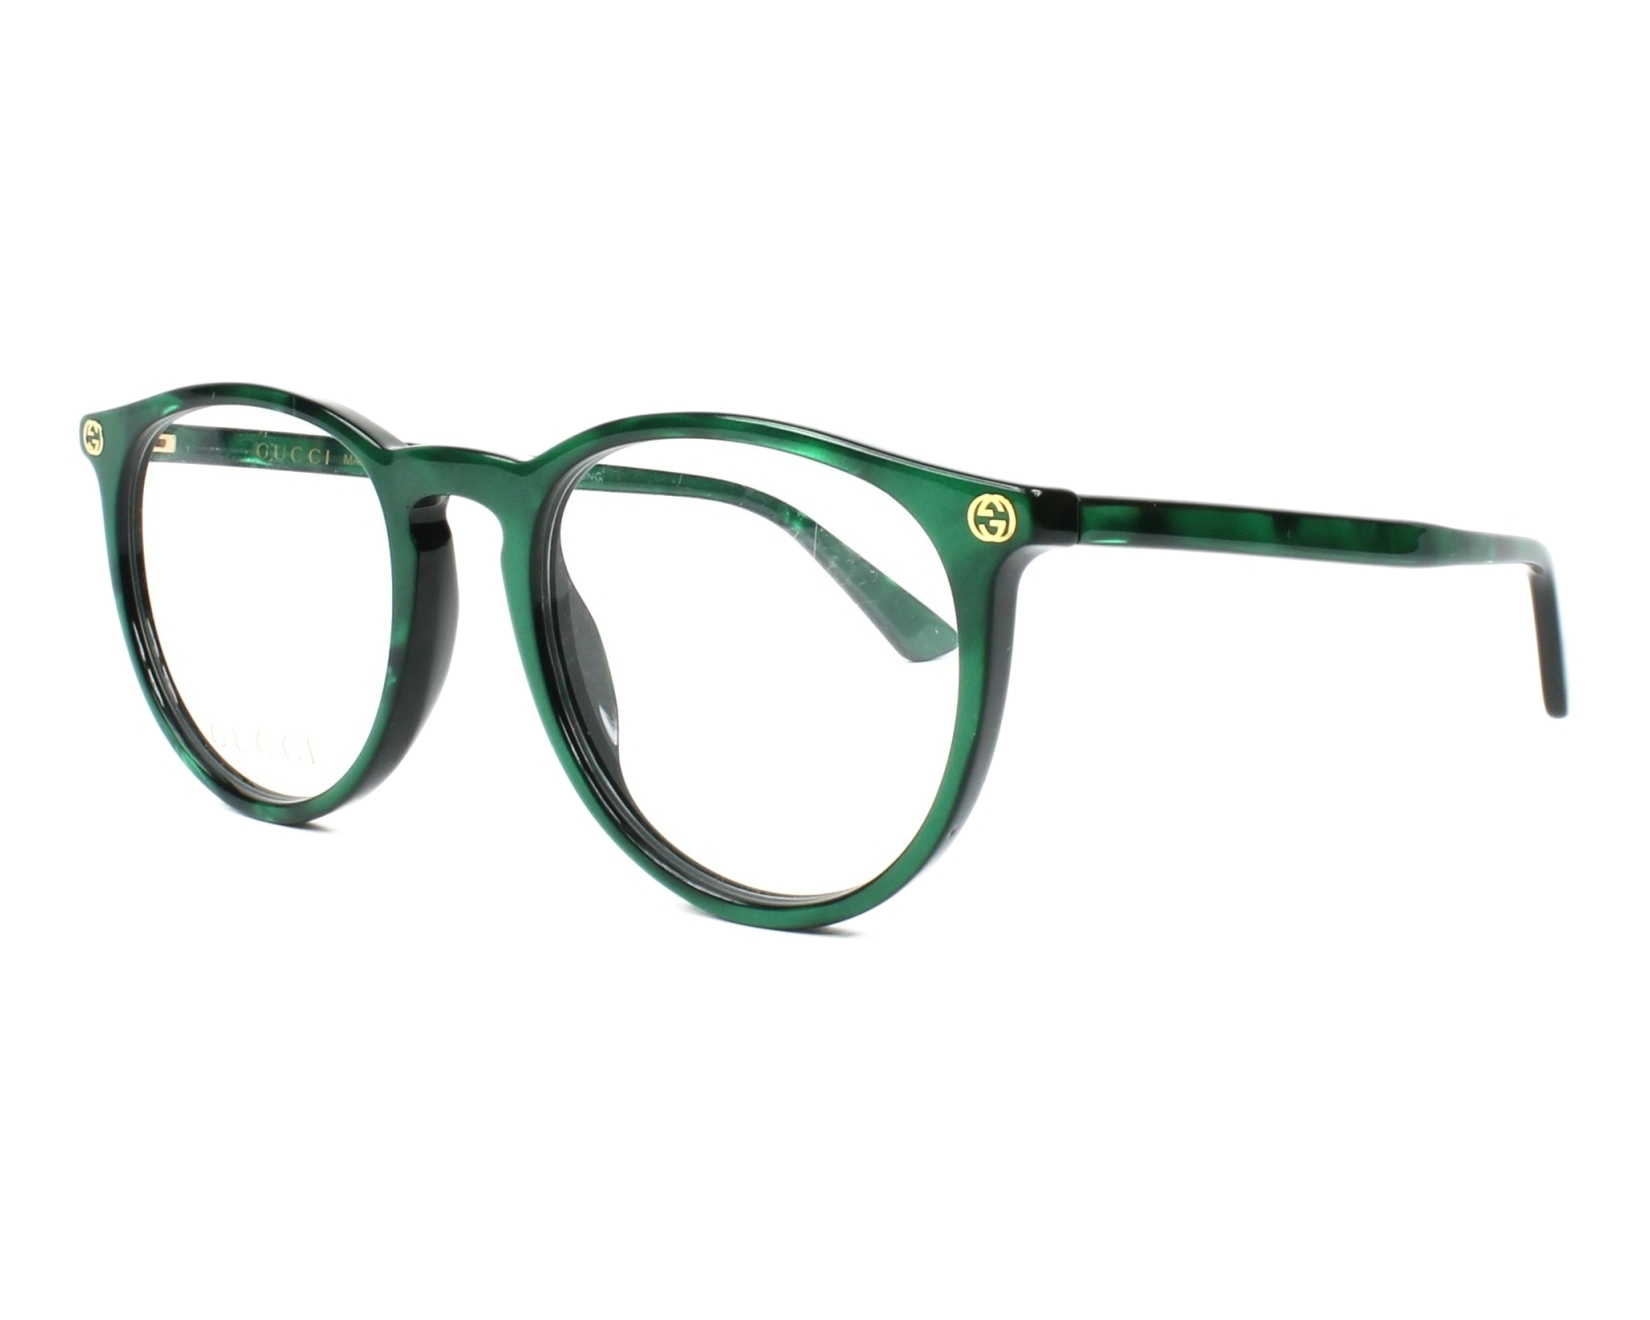 0e0fdeffc198 eyeglasses Gucci GG-00270 006 50-20 Green Green profile view